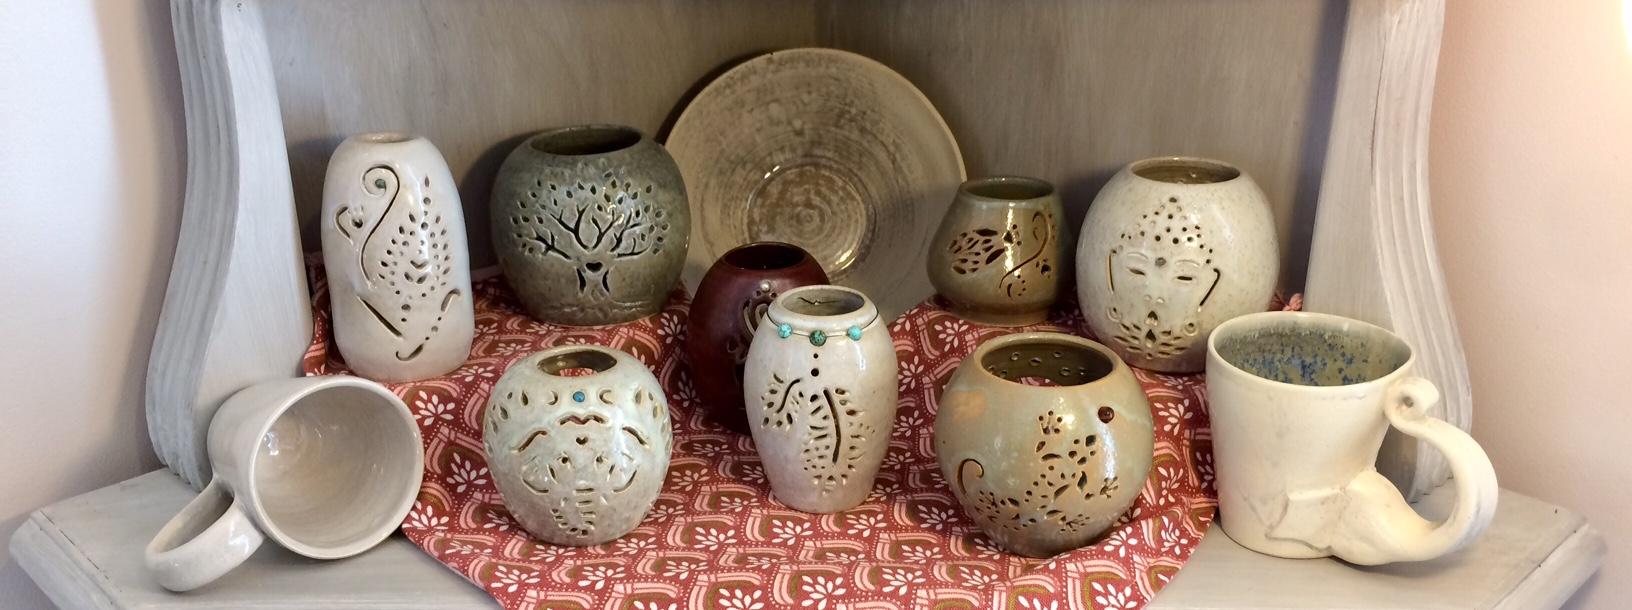 Dracénie Provence Verdon Agglomération - Lolidade créations céramique